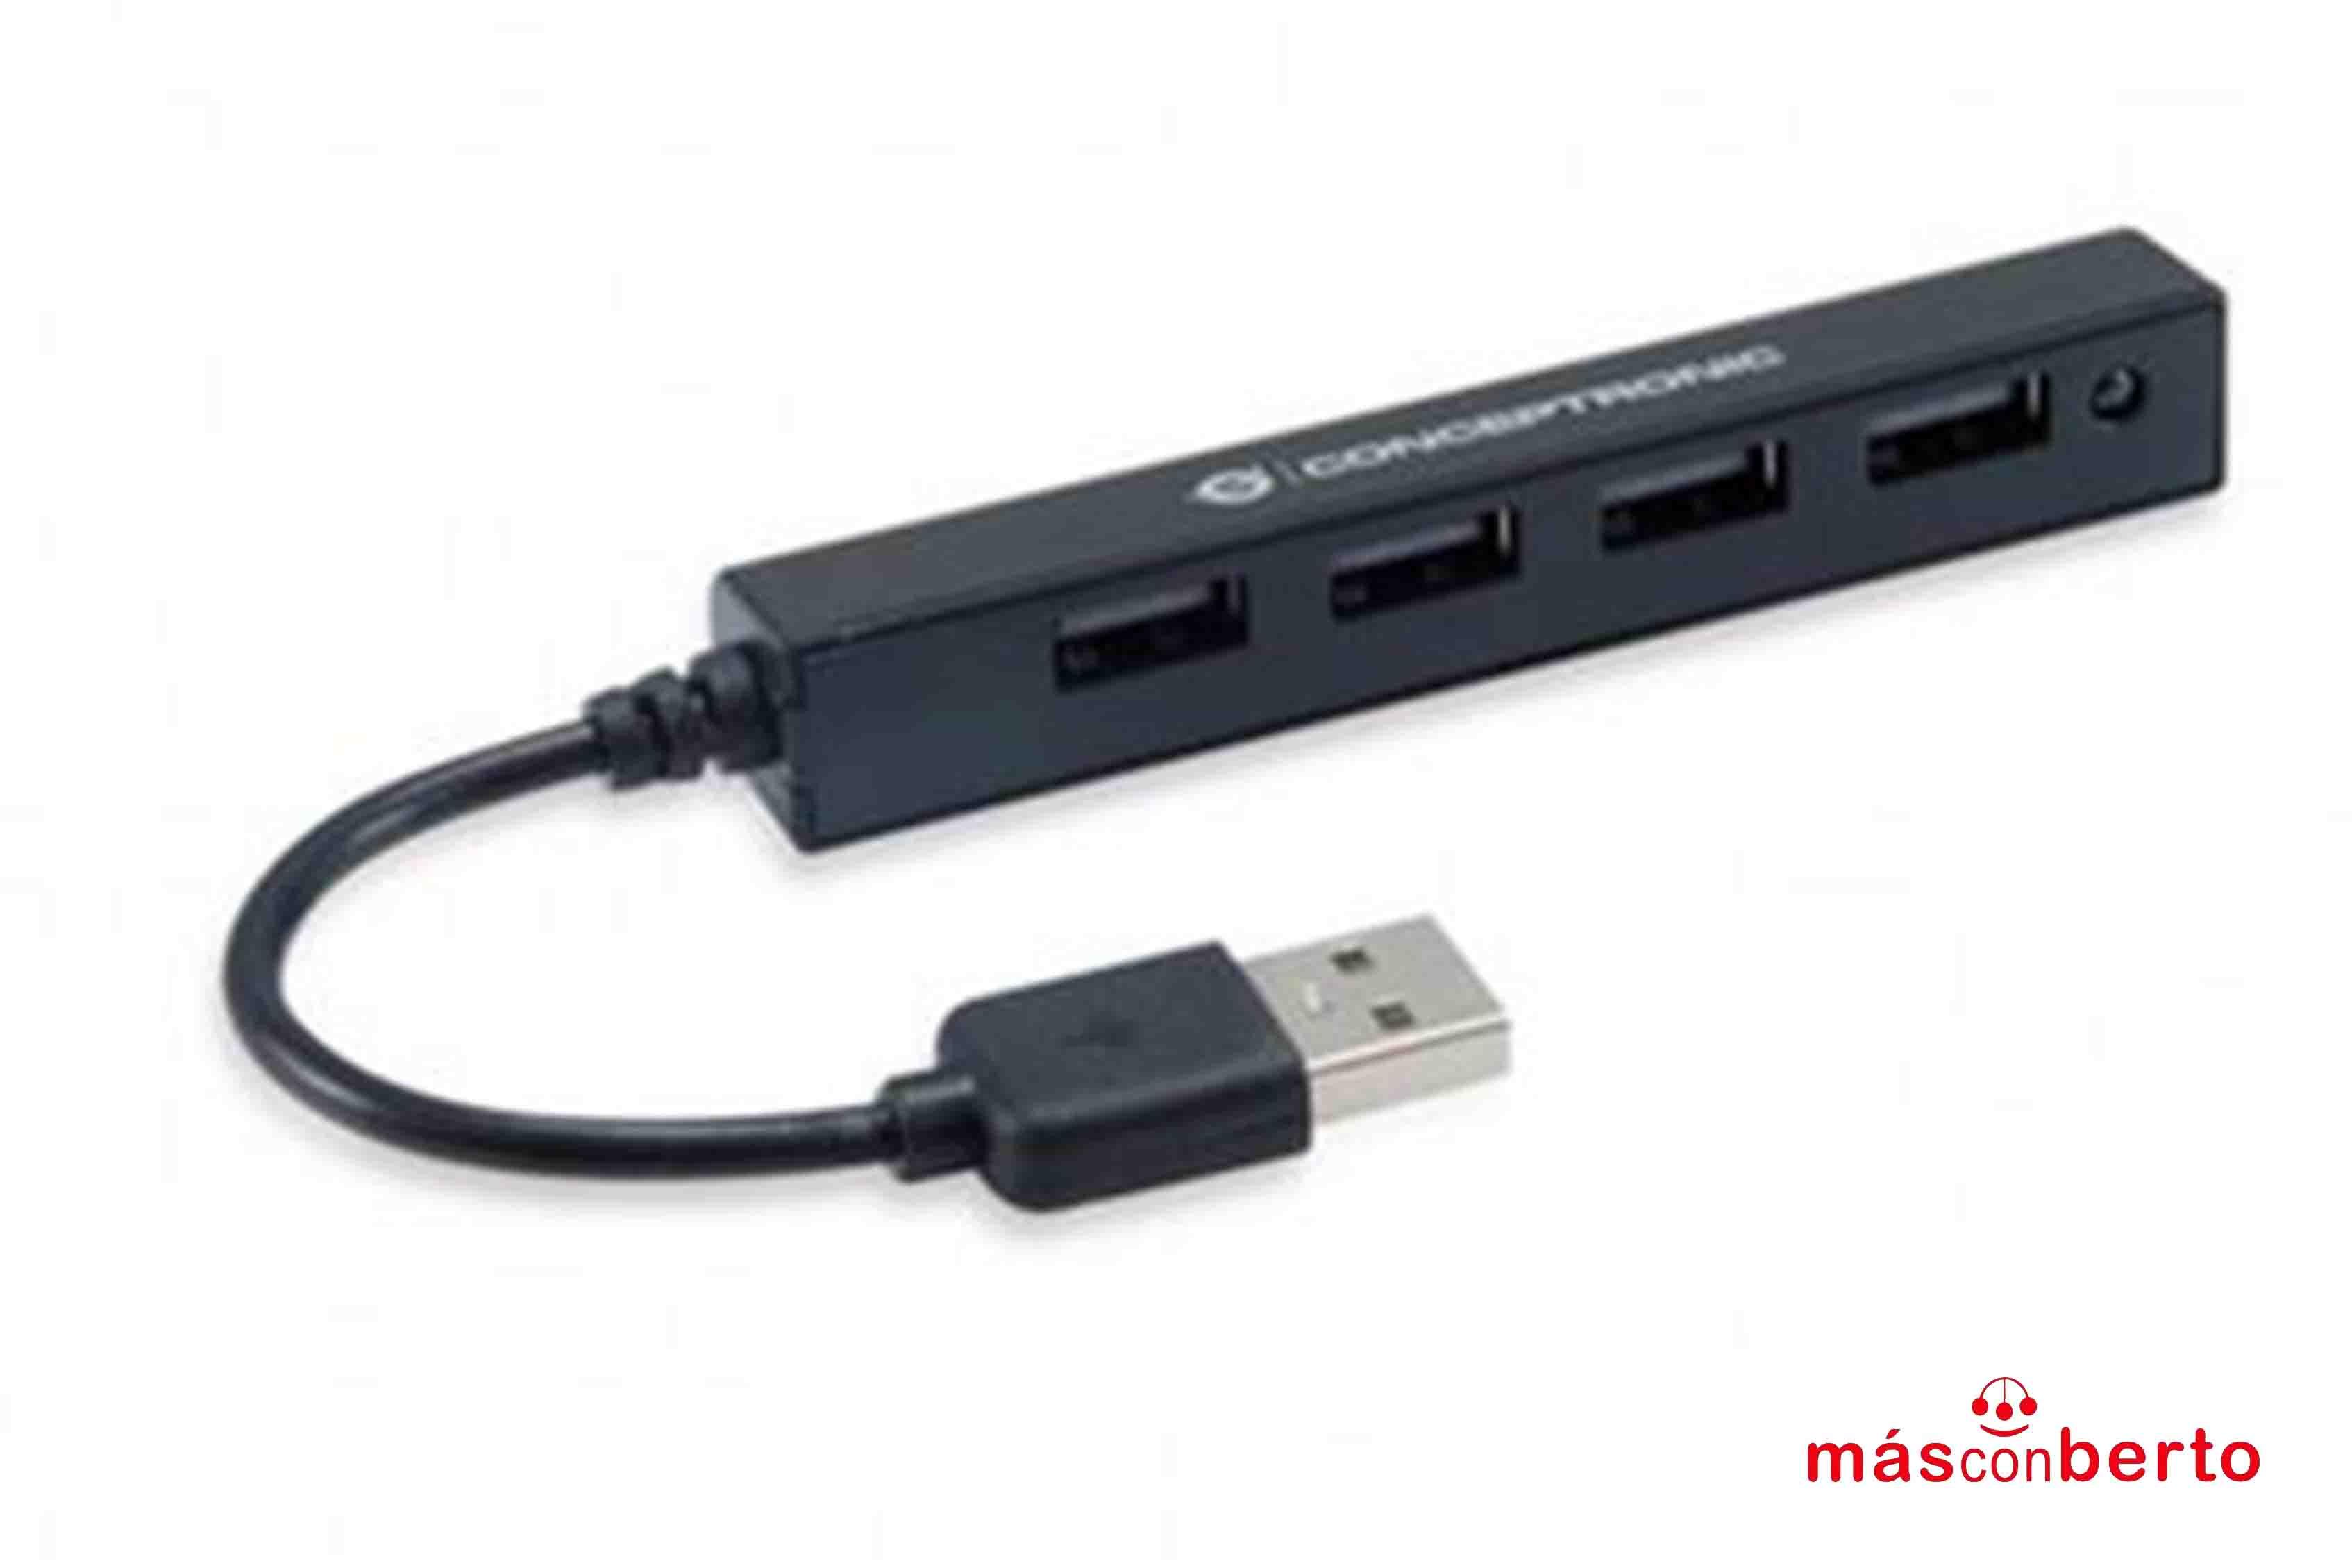 Hub USB 2.0 Conceptronic 4...